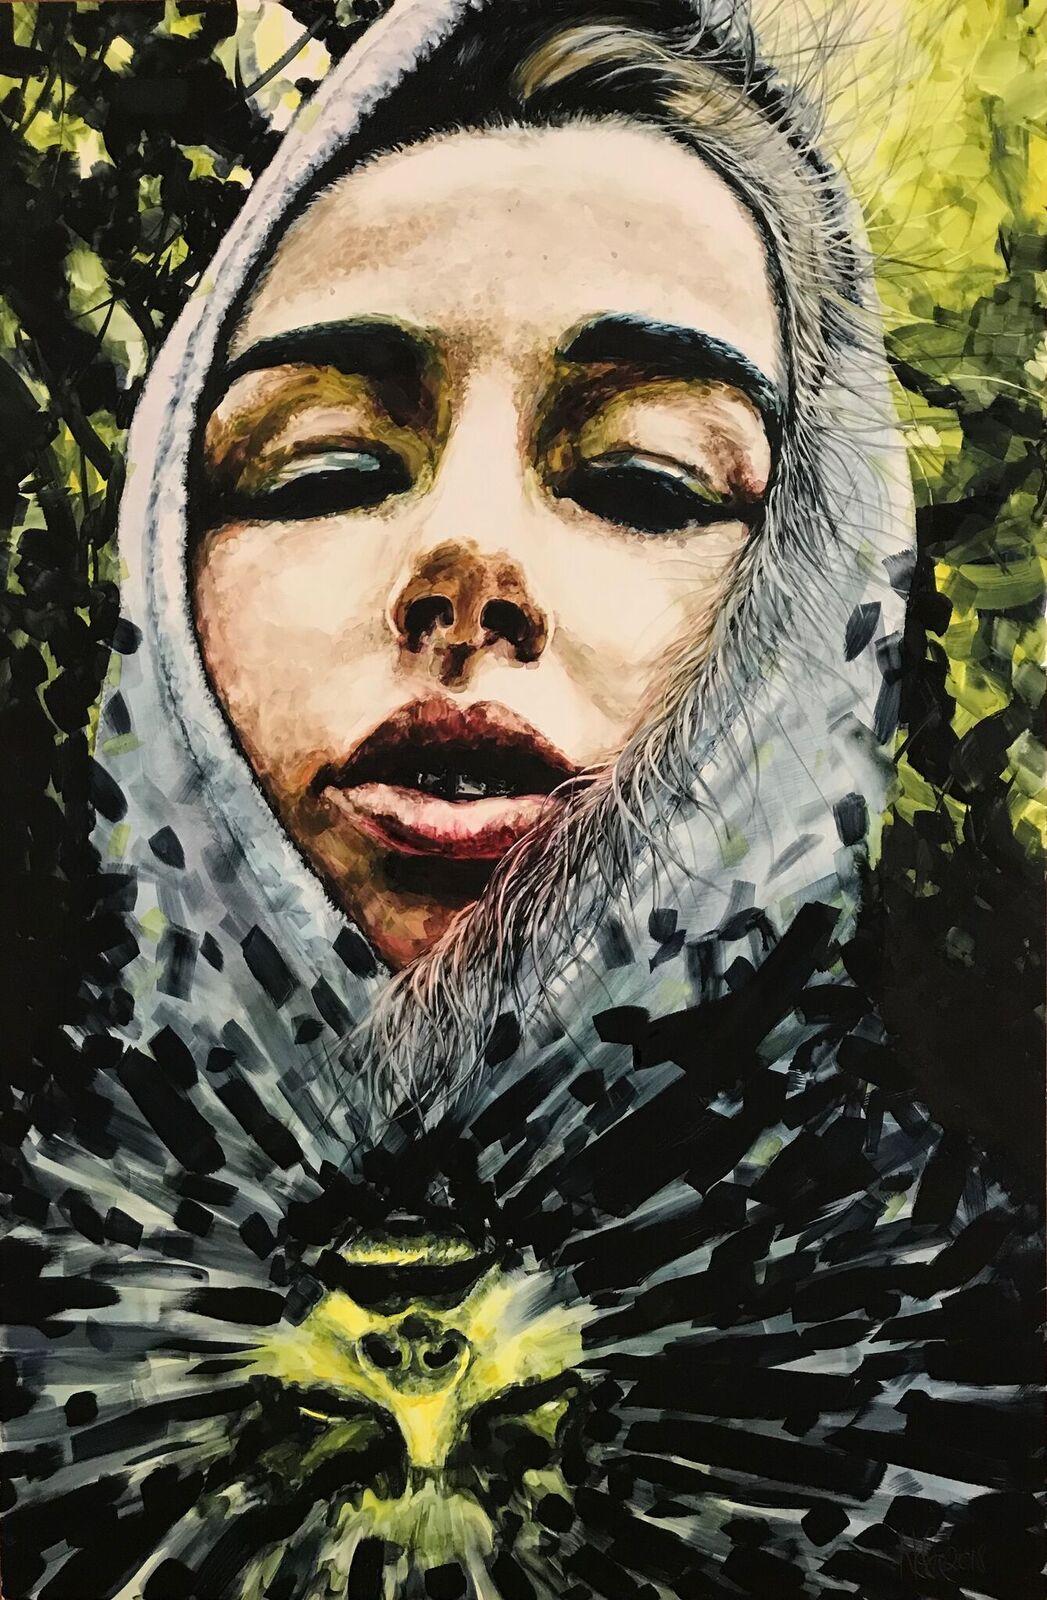 """Portrait Fragment"" Series, ""La Payasa"""